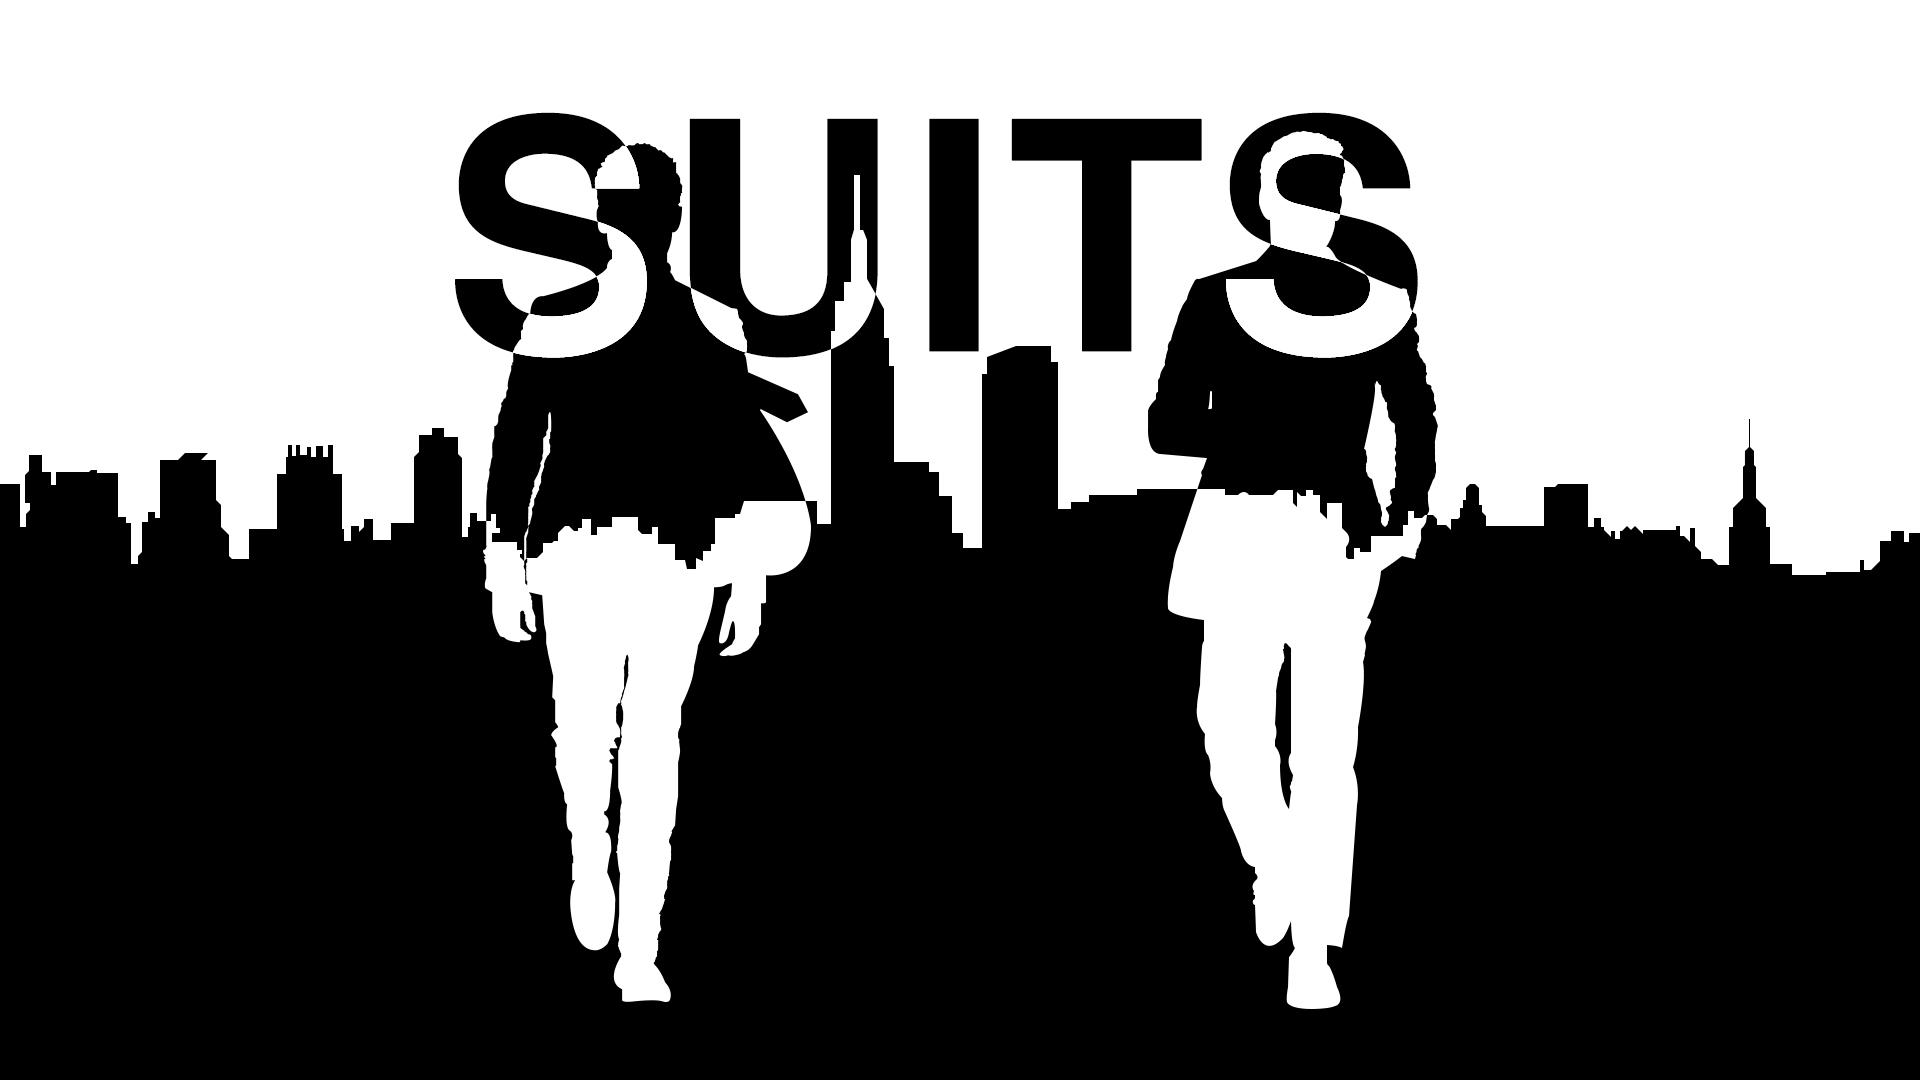 Suits - W garniturach tapeta7